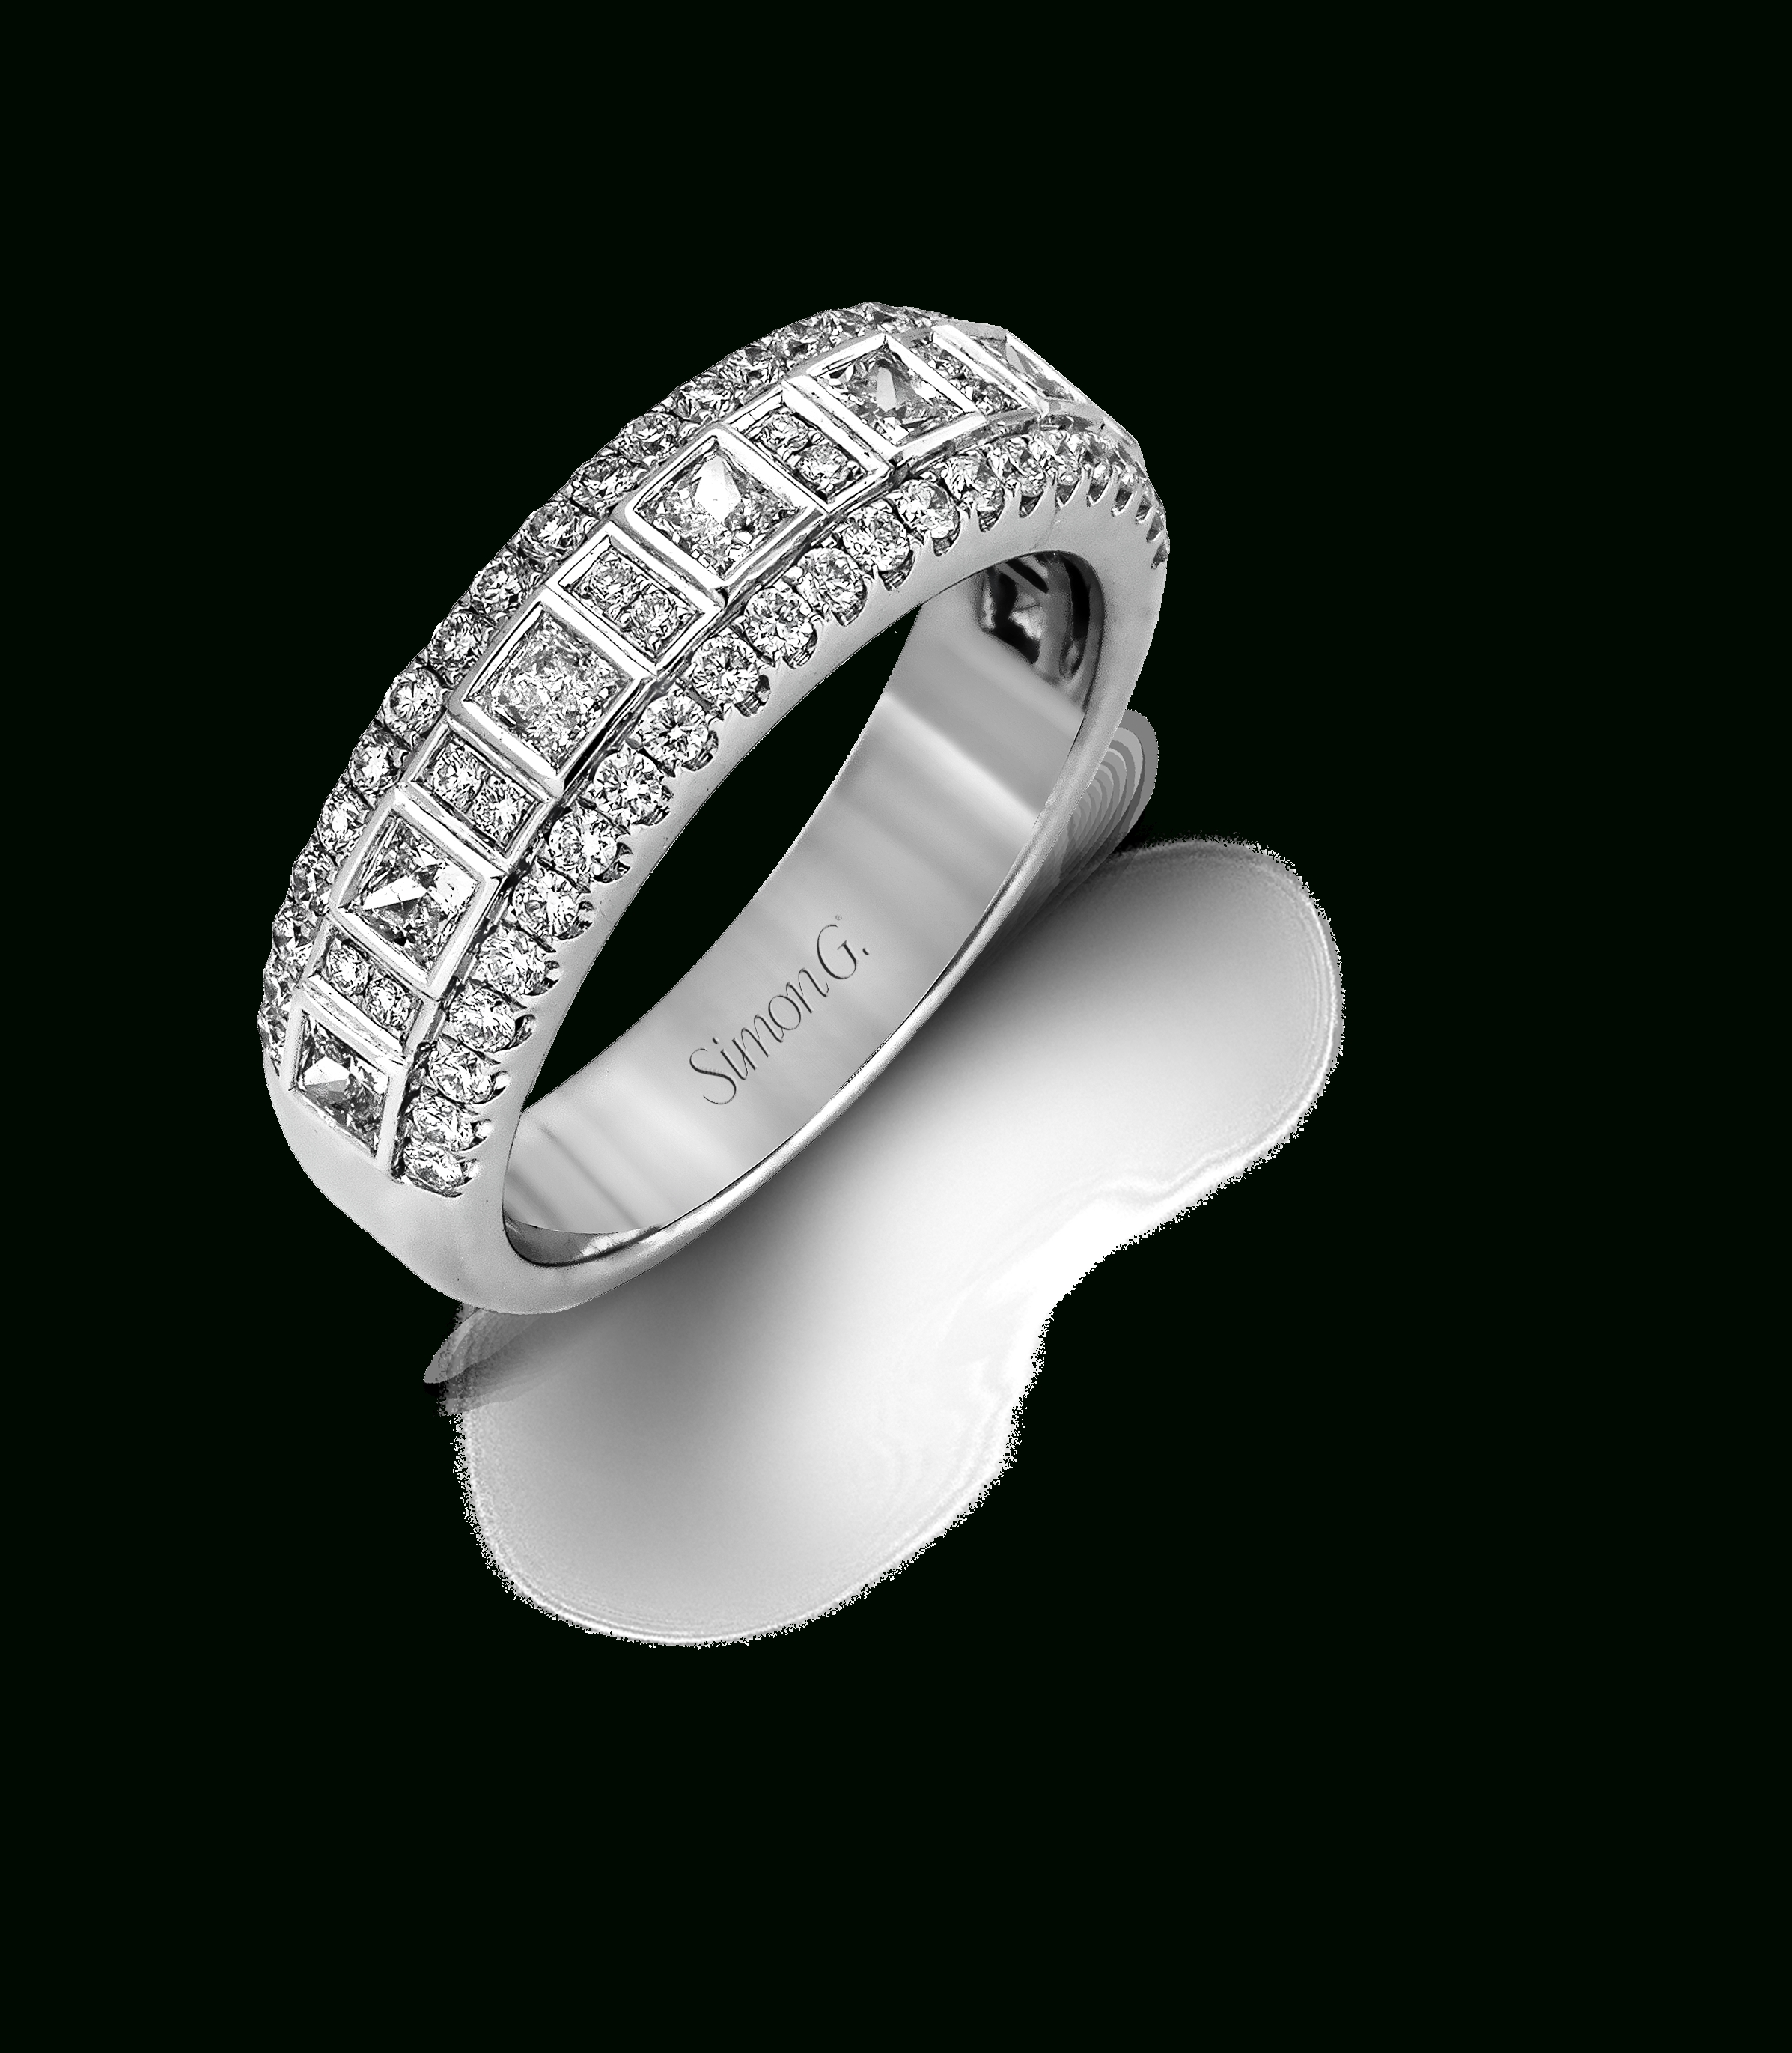 50Th Wedding Anniversary Diamond Rings Plus Anniversary Diamond In Most Recent Diamond Wedding Anniversary Rings (Gallery 13 of 25)